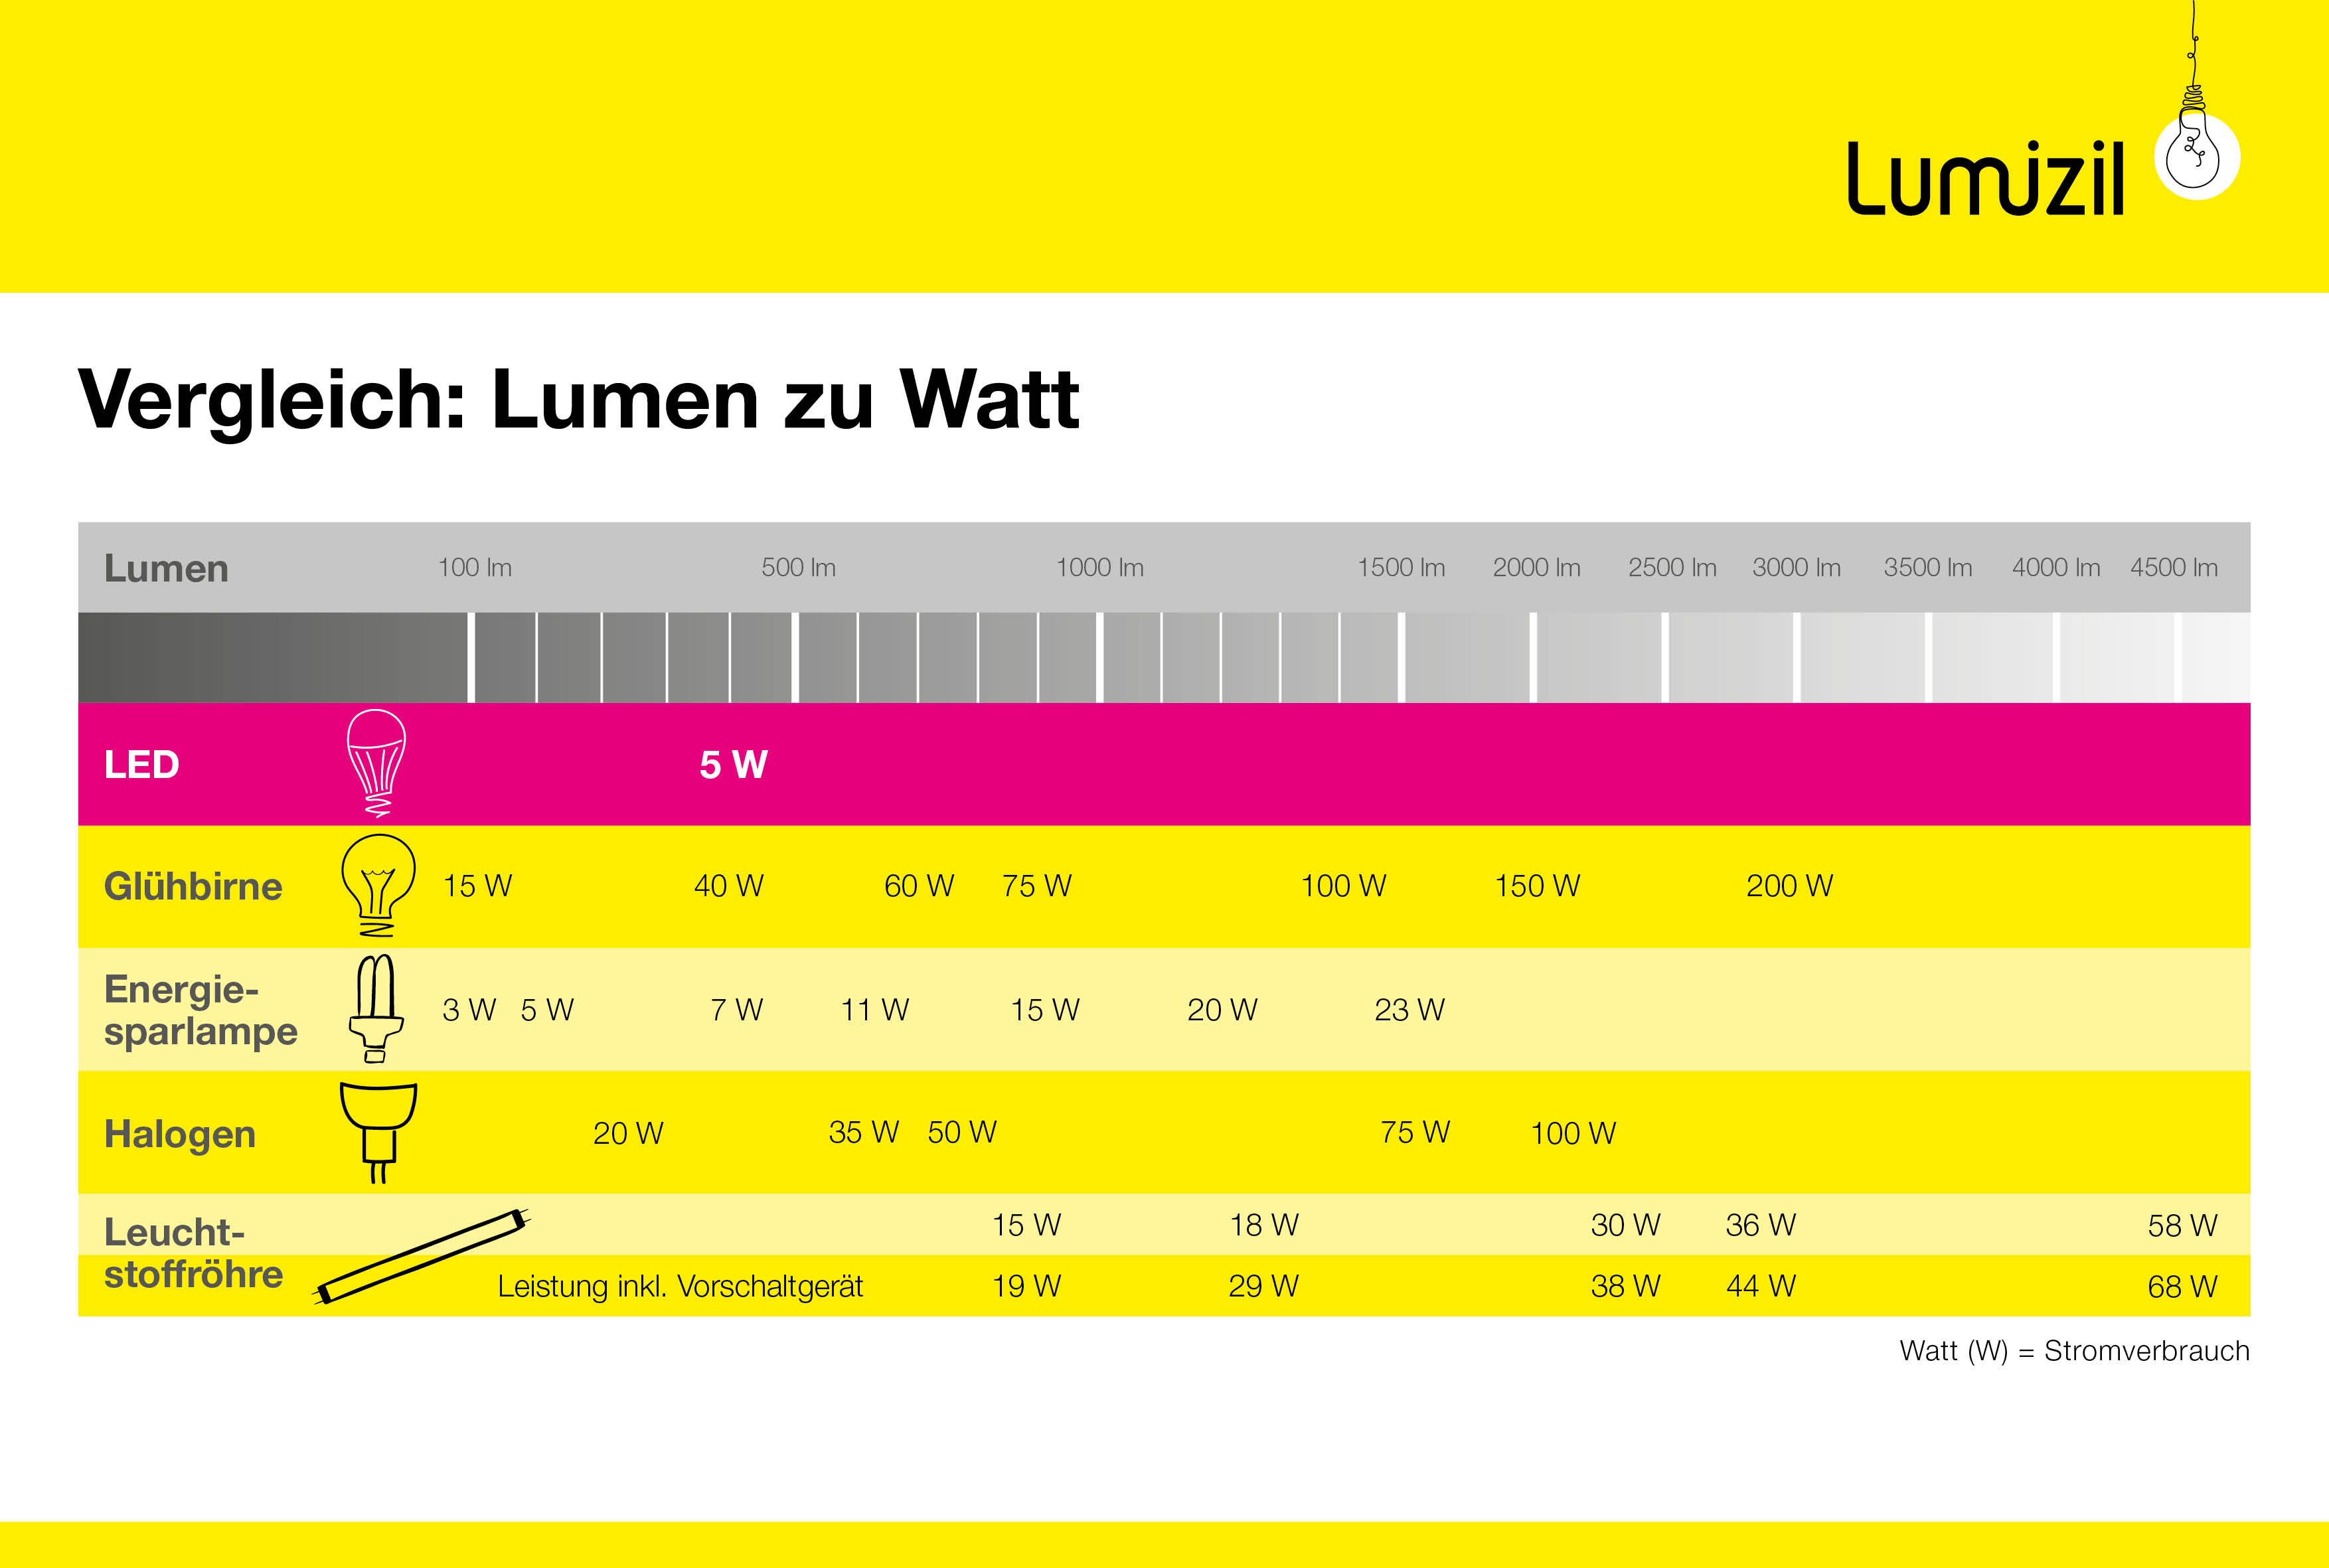 Lumen » SI-Einheit des Lichtstroms im Lampen-Lexikon | lumizil